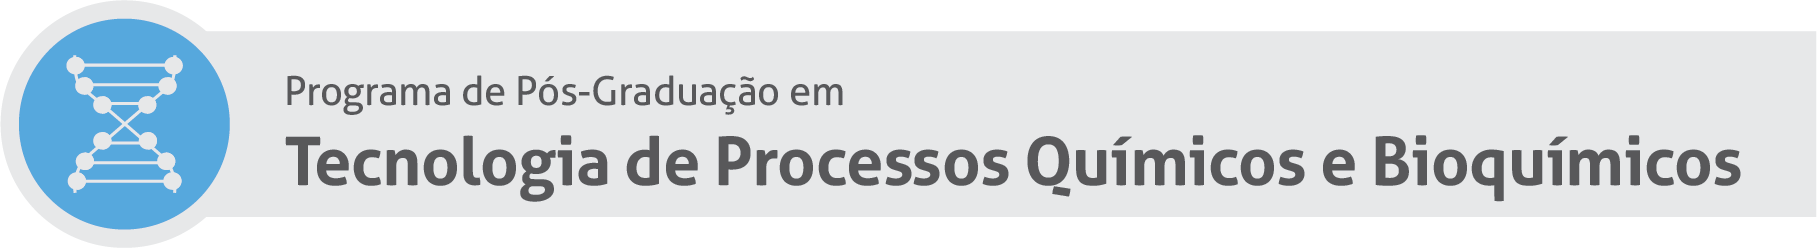 TecnologiaProcessosQuimicos